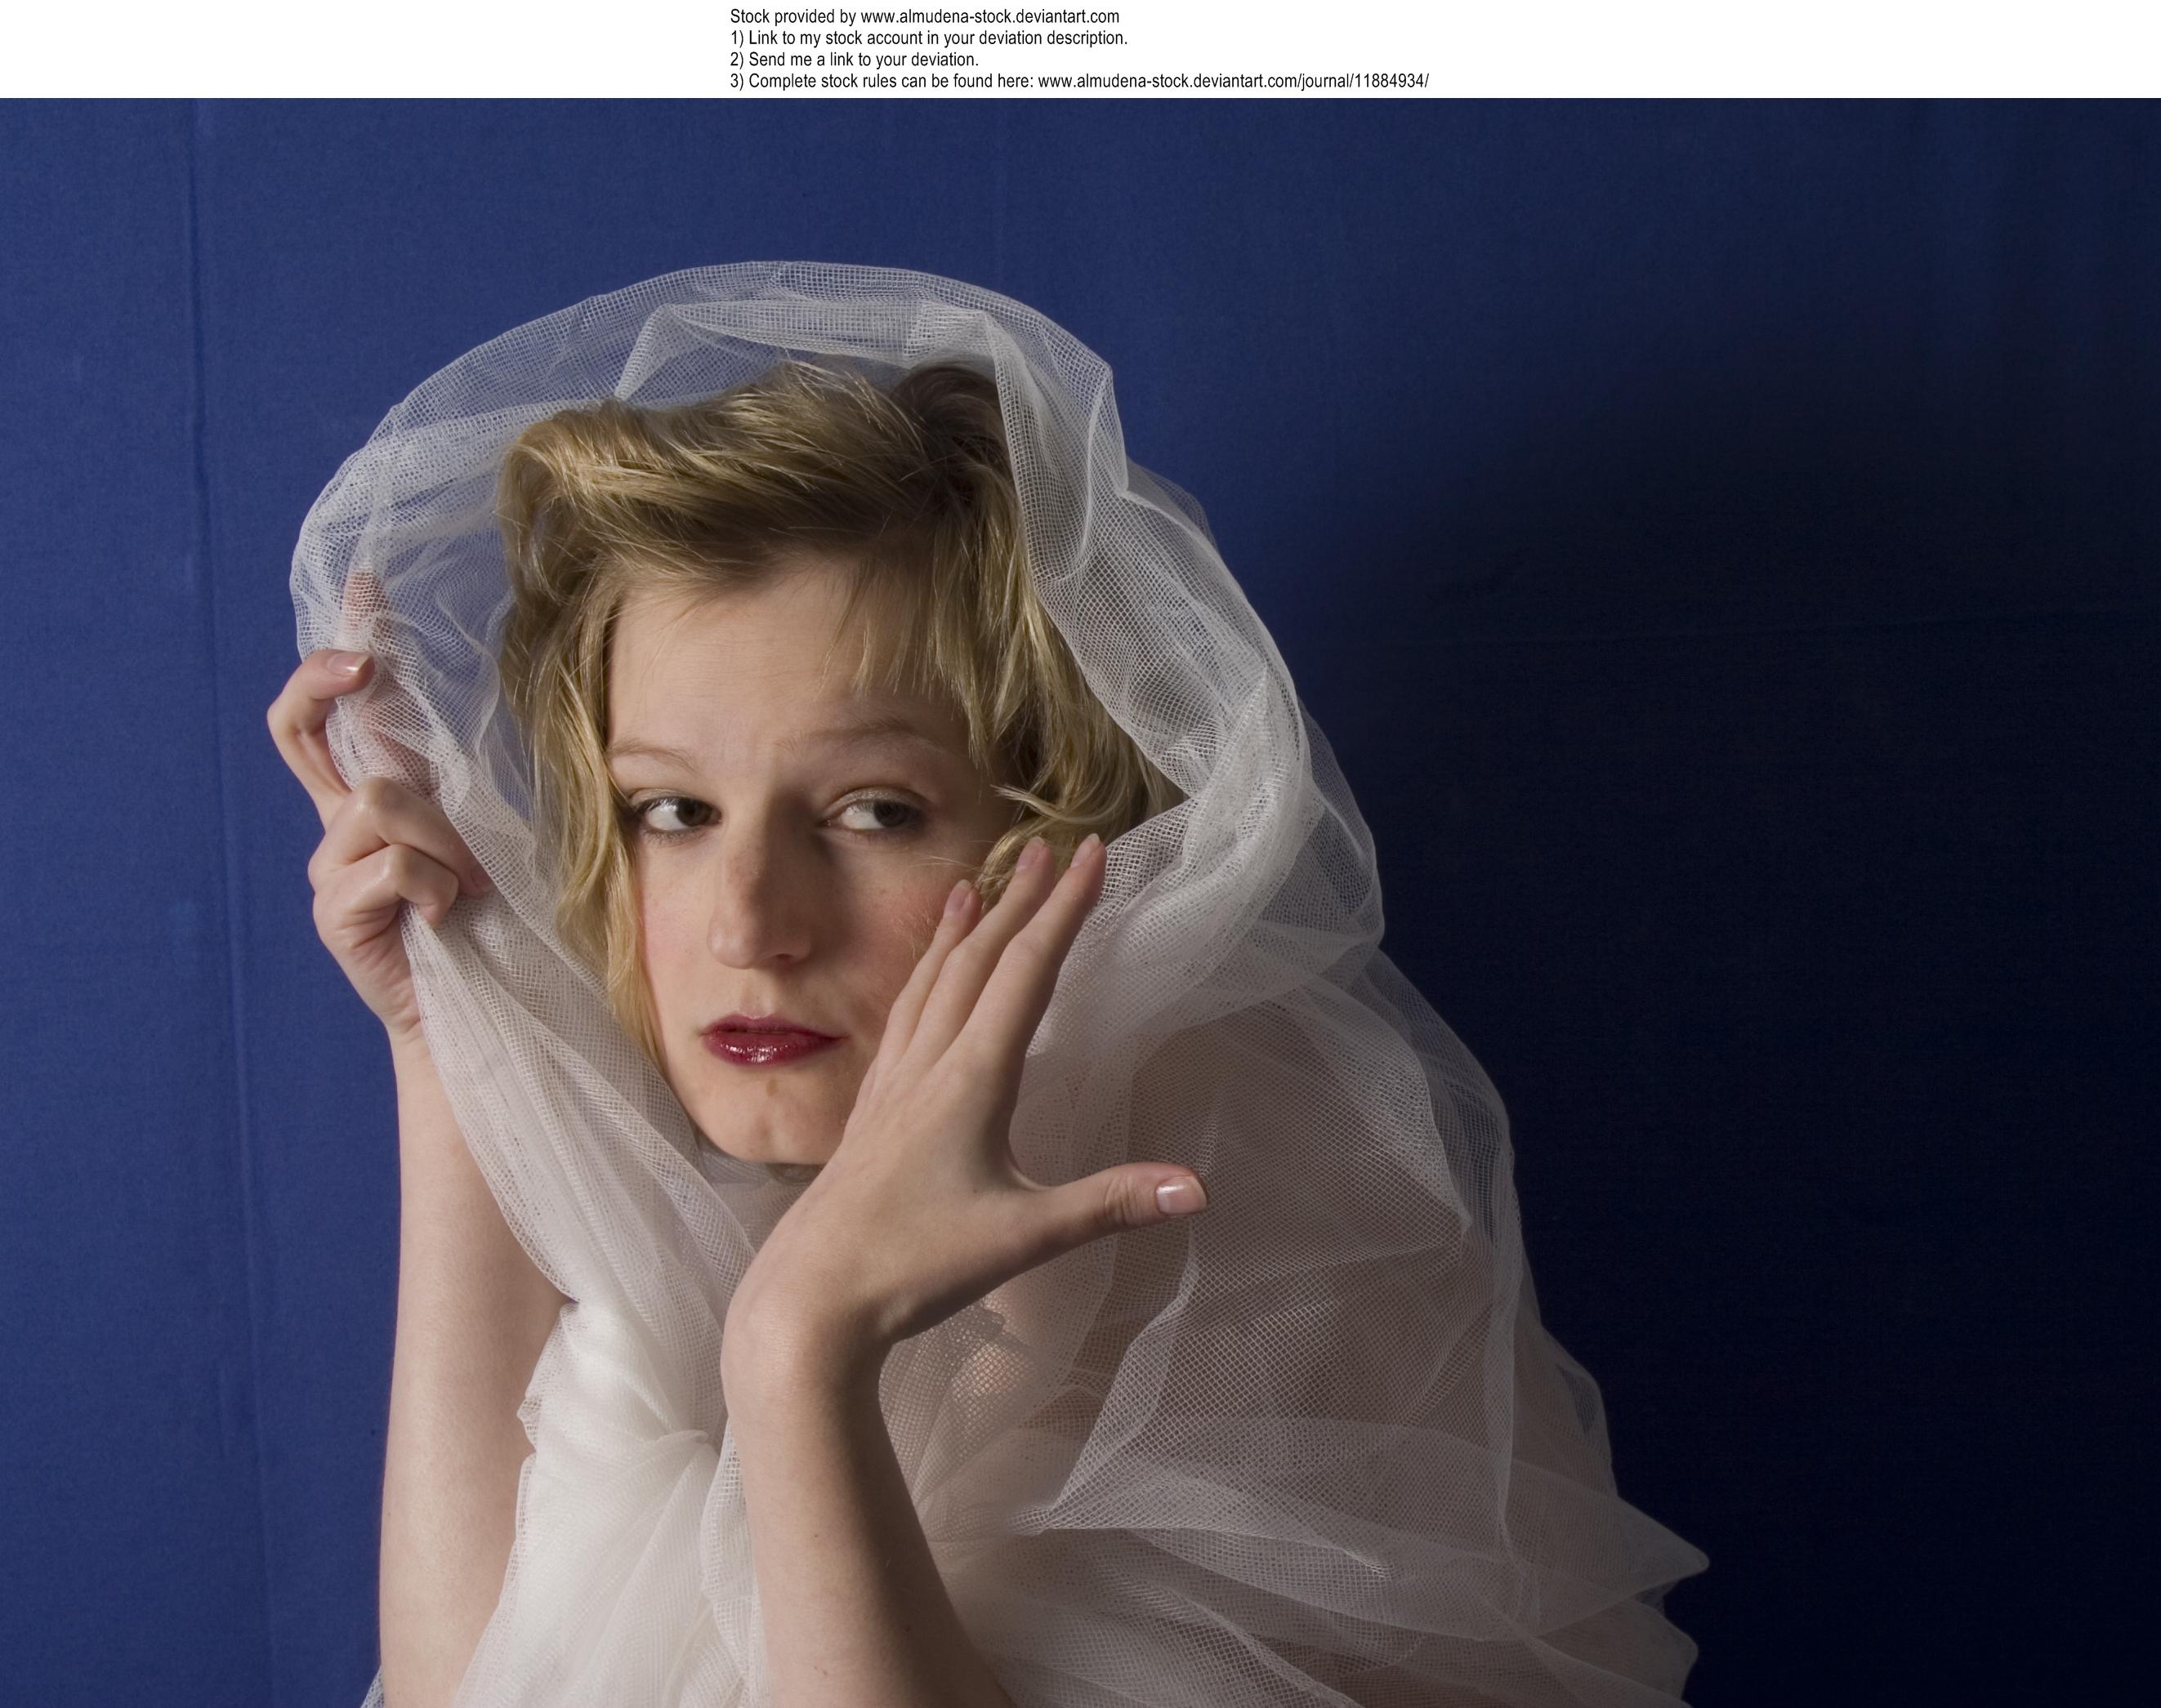 Swan 7 by almudena-stock